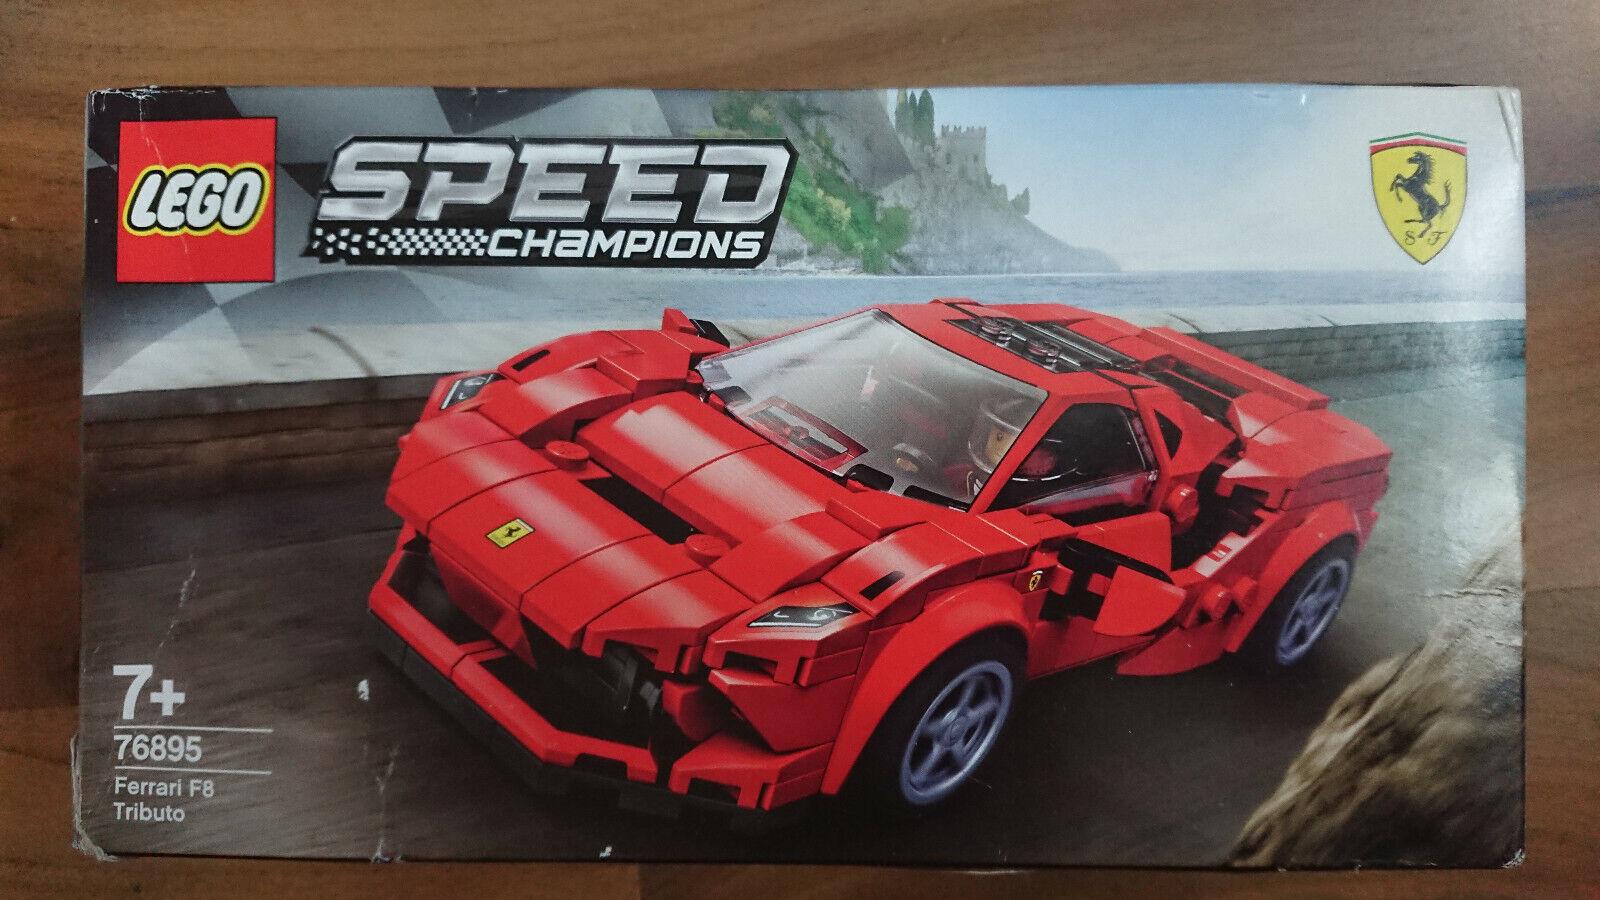 Lego Speed Champions Ferrari F8 Tributo 76895 Günstig Kaufen Ebay